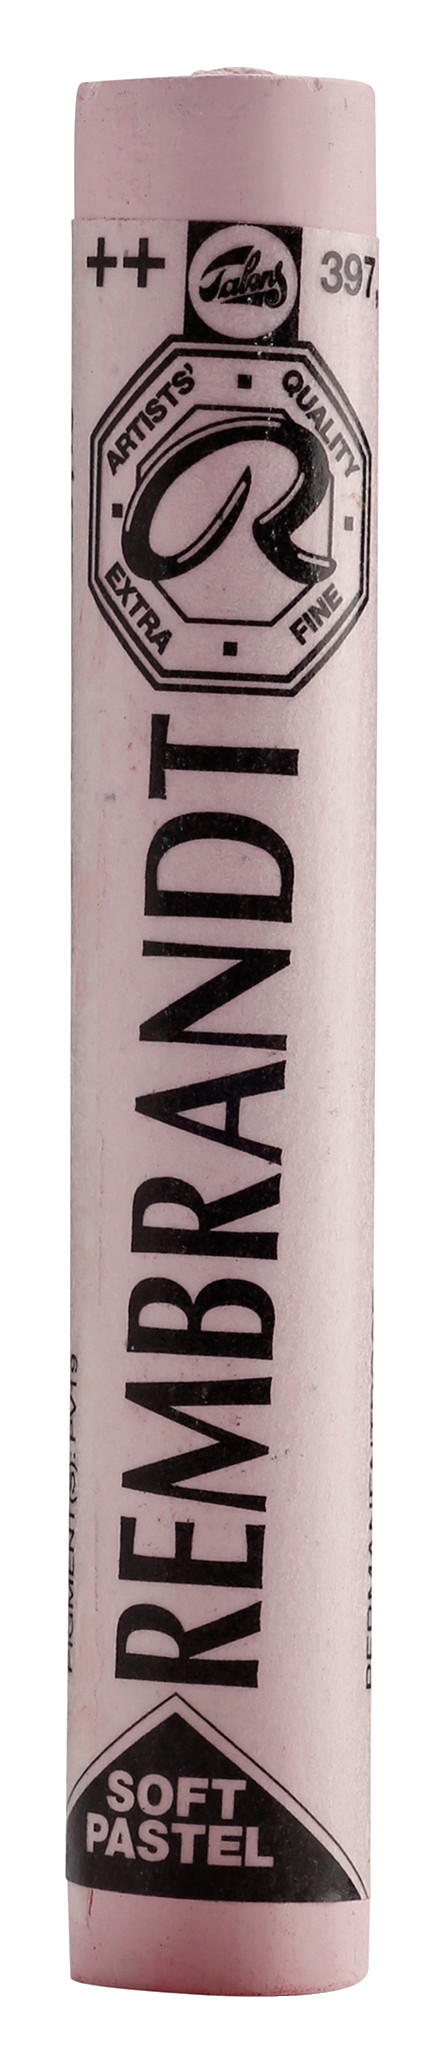 Rembrandt Soft Pastel Round Full Stick Permanent Rose(10) (397.1)